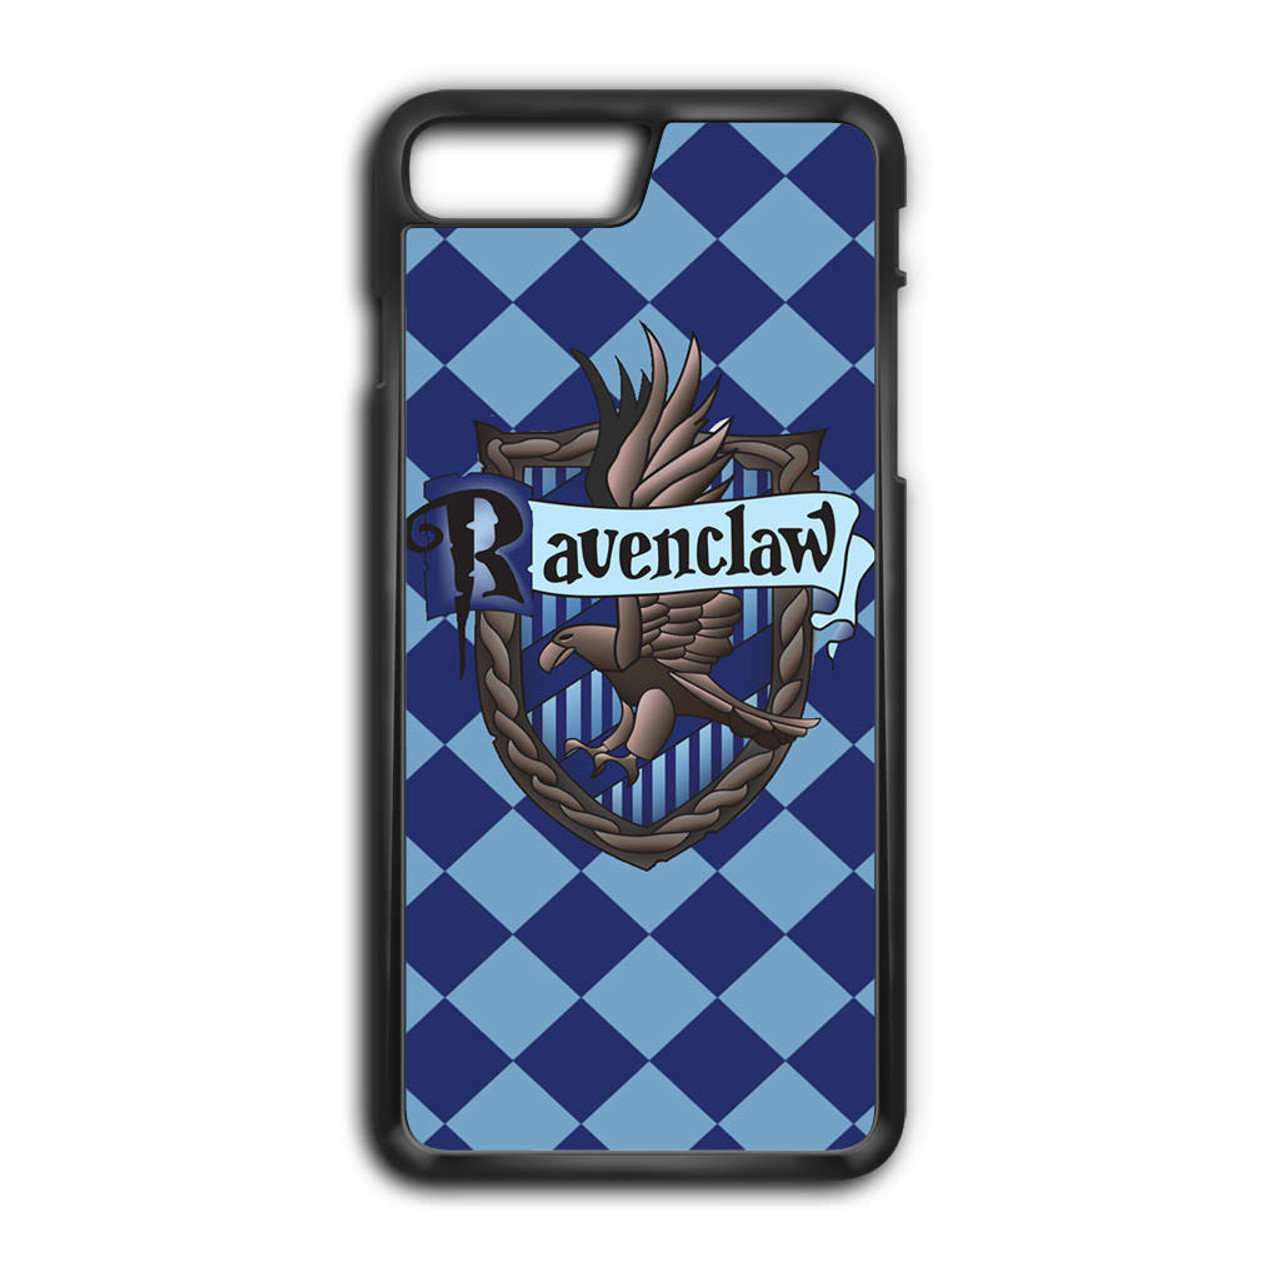 huge discount c0c43 6a8a0 Hoghwart School - Ravenclaw iPhone 7 Plus Case